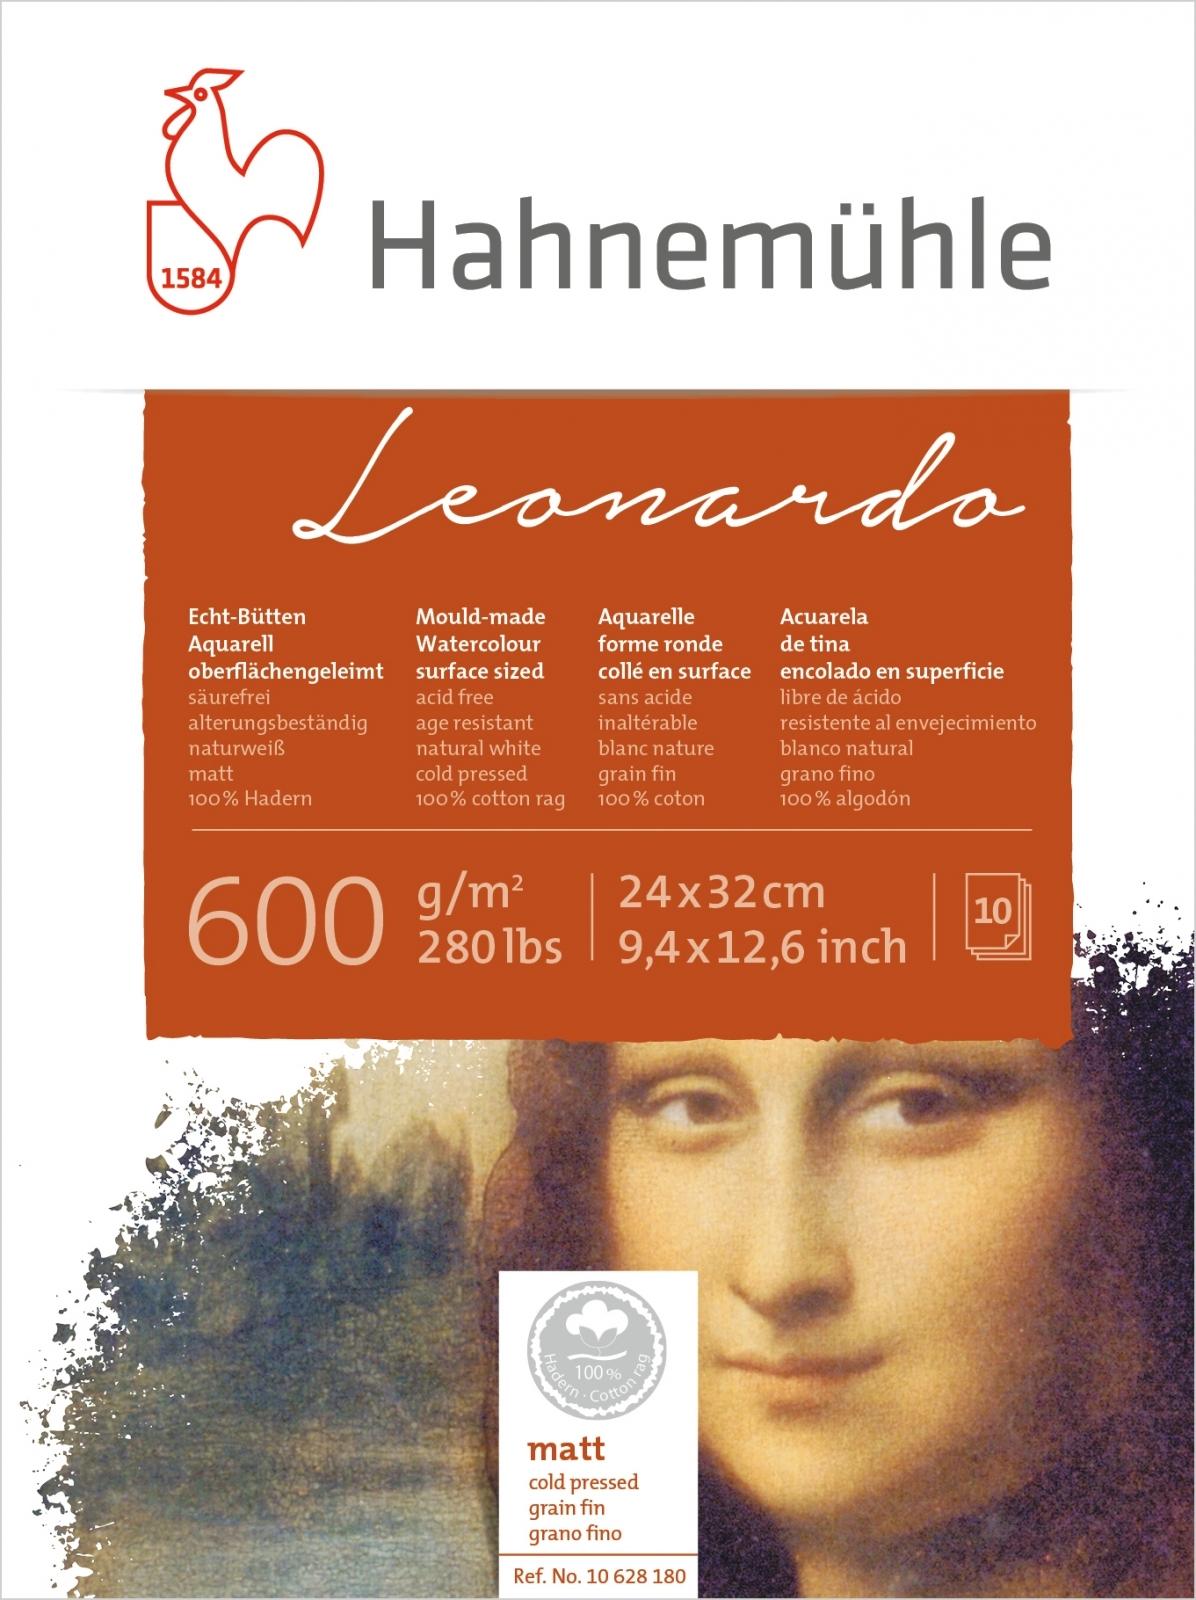 Papel Hahnemuhle Leonardo Textura Fina 600g/m2 24x32 10fls 1 - Papelaria Botafogo